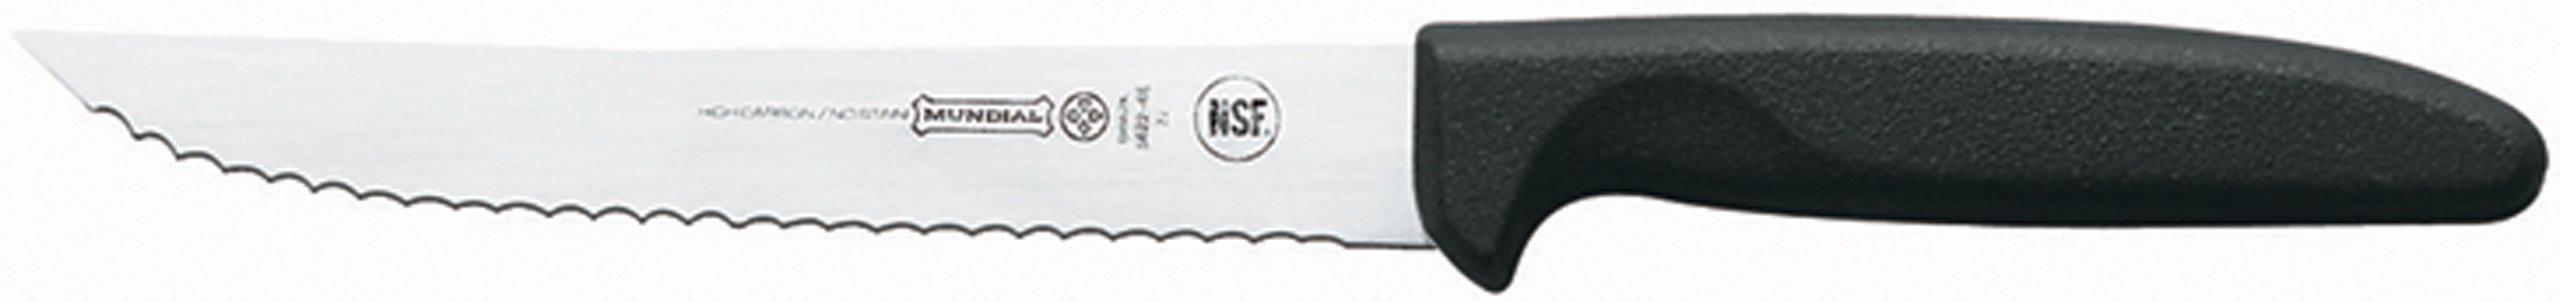 Mundial 5622-6E 6-Inch Slicing Serrated Edge Utility Knife, Black